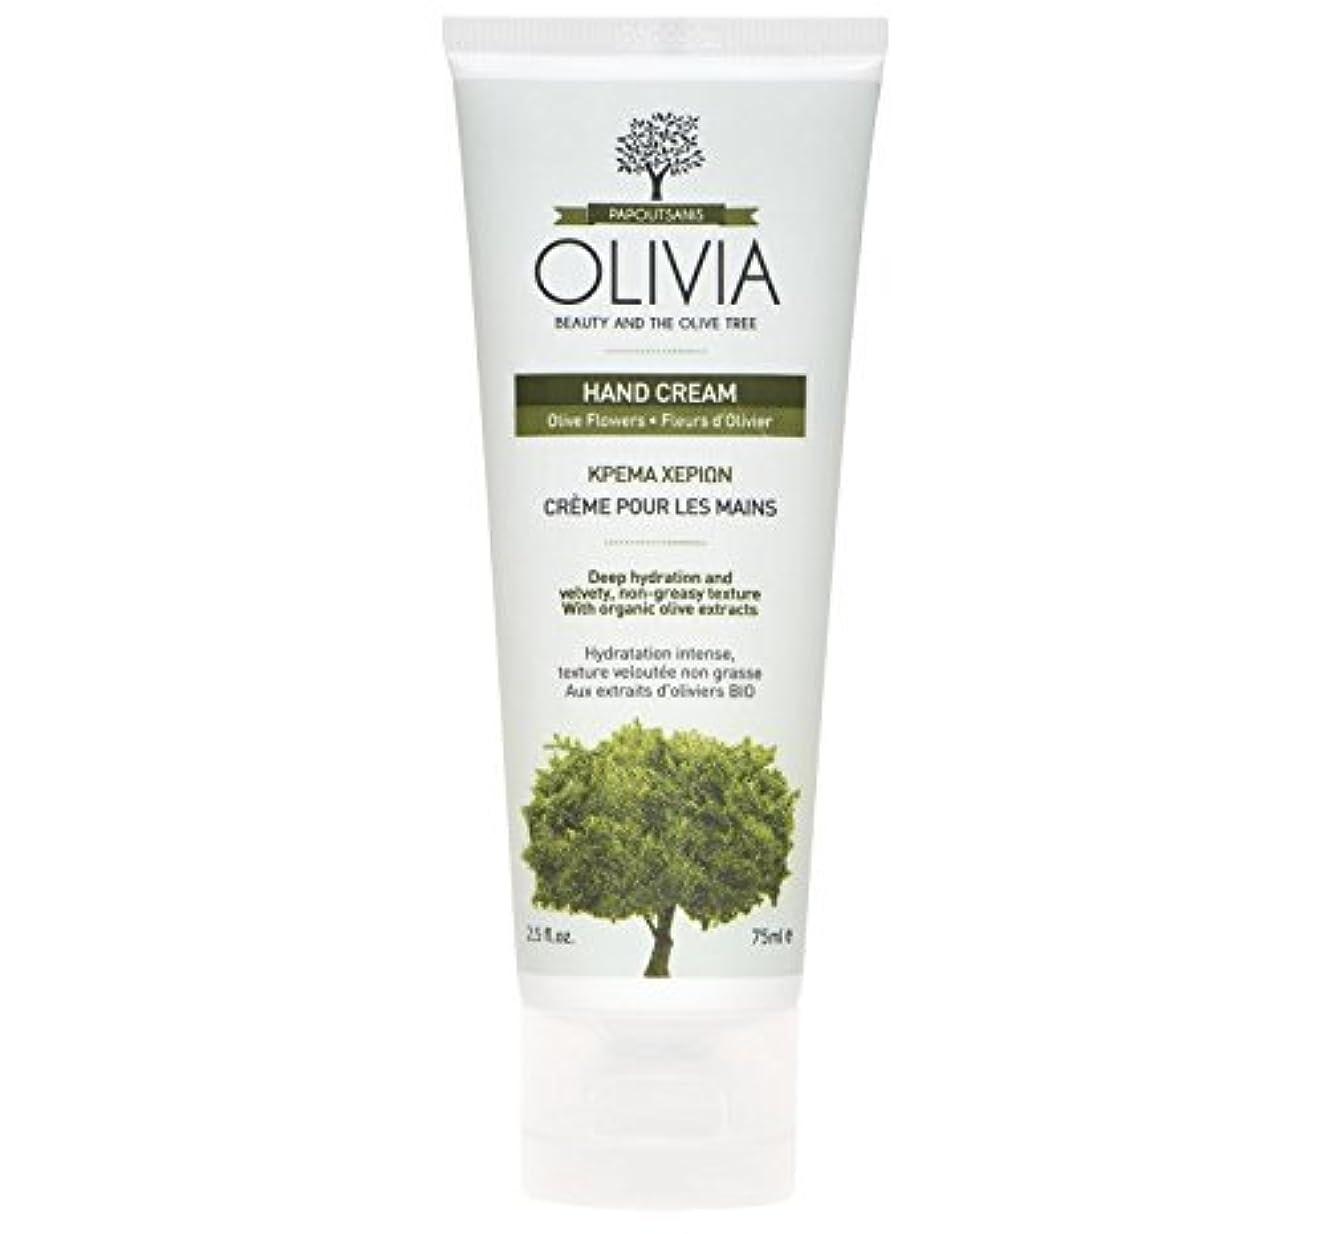 Olivia ハンドクリーム - オリーブの花2.5液量オンス